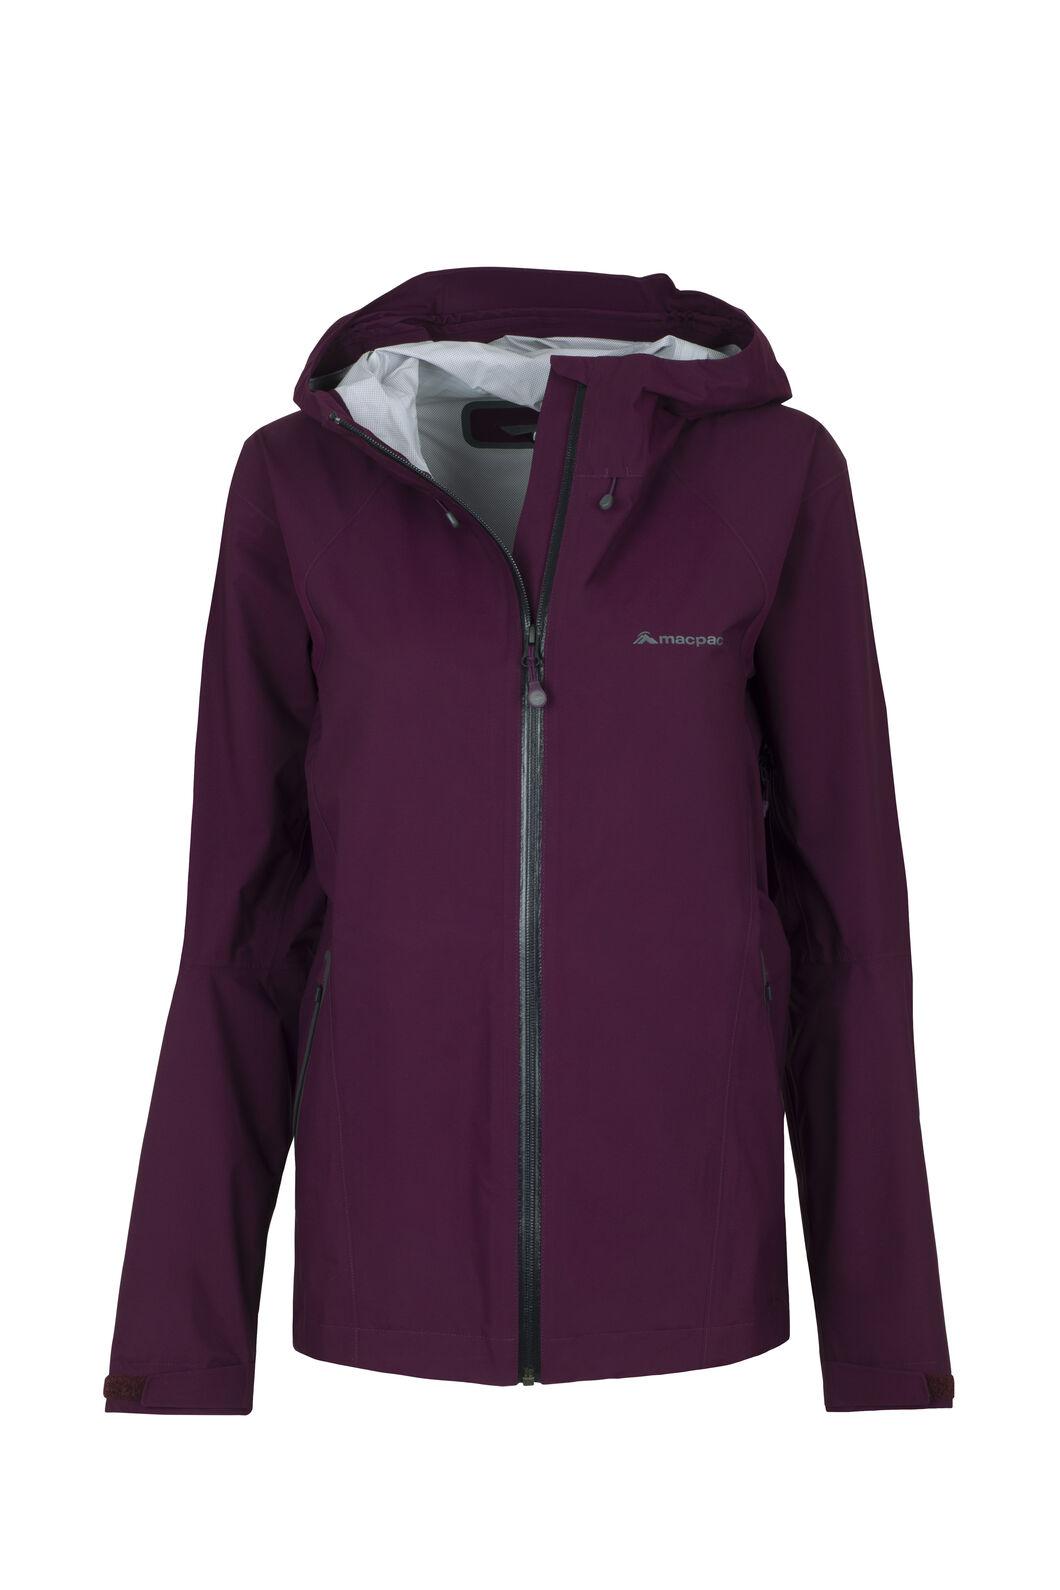 Macpac Less is Less Rain Jacket - Women's, Potent Purple, hi-res